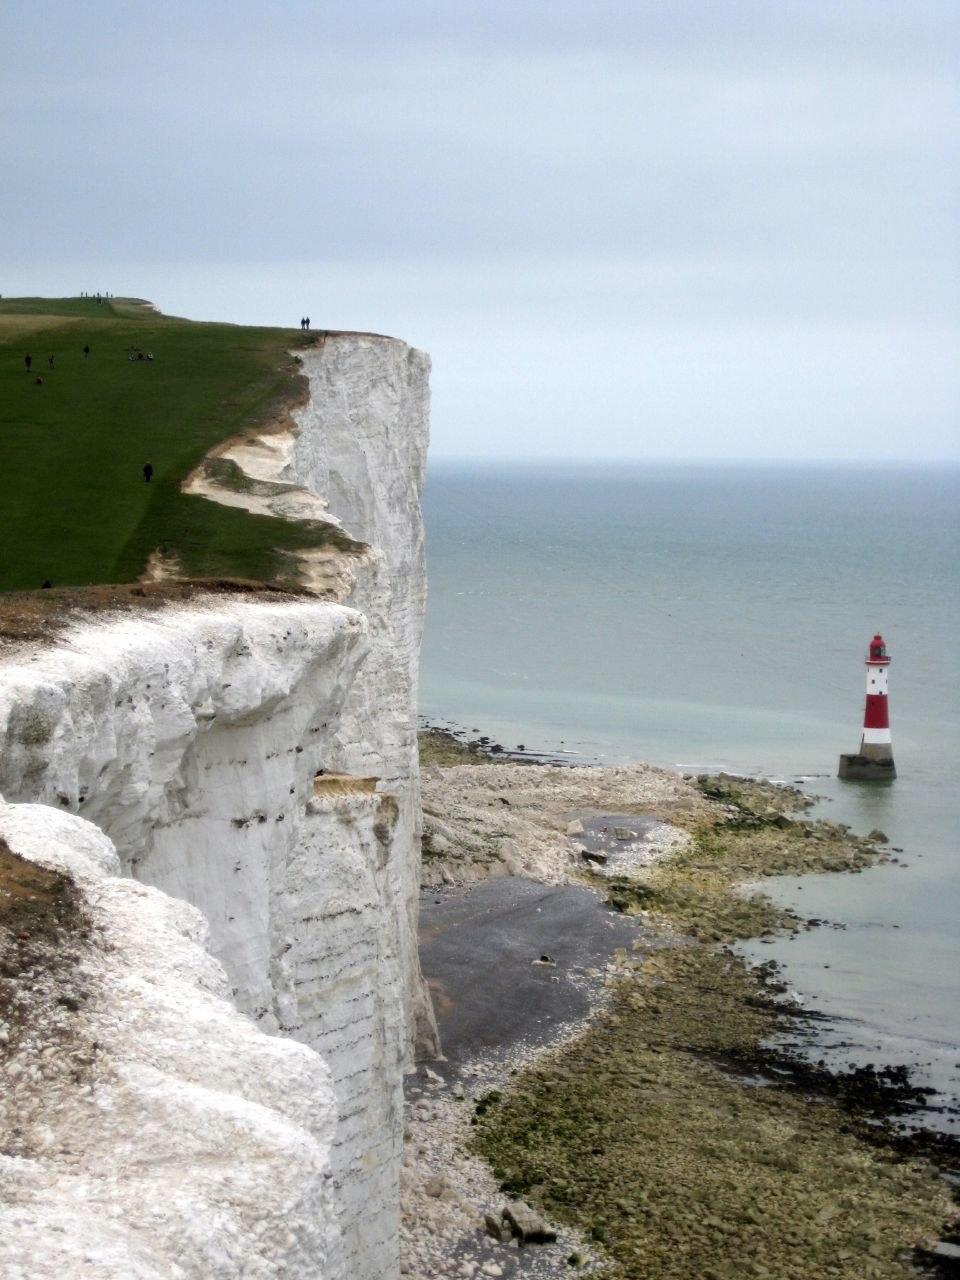 Beachy Head and Lighthouse, UK